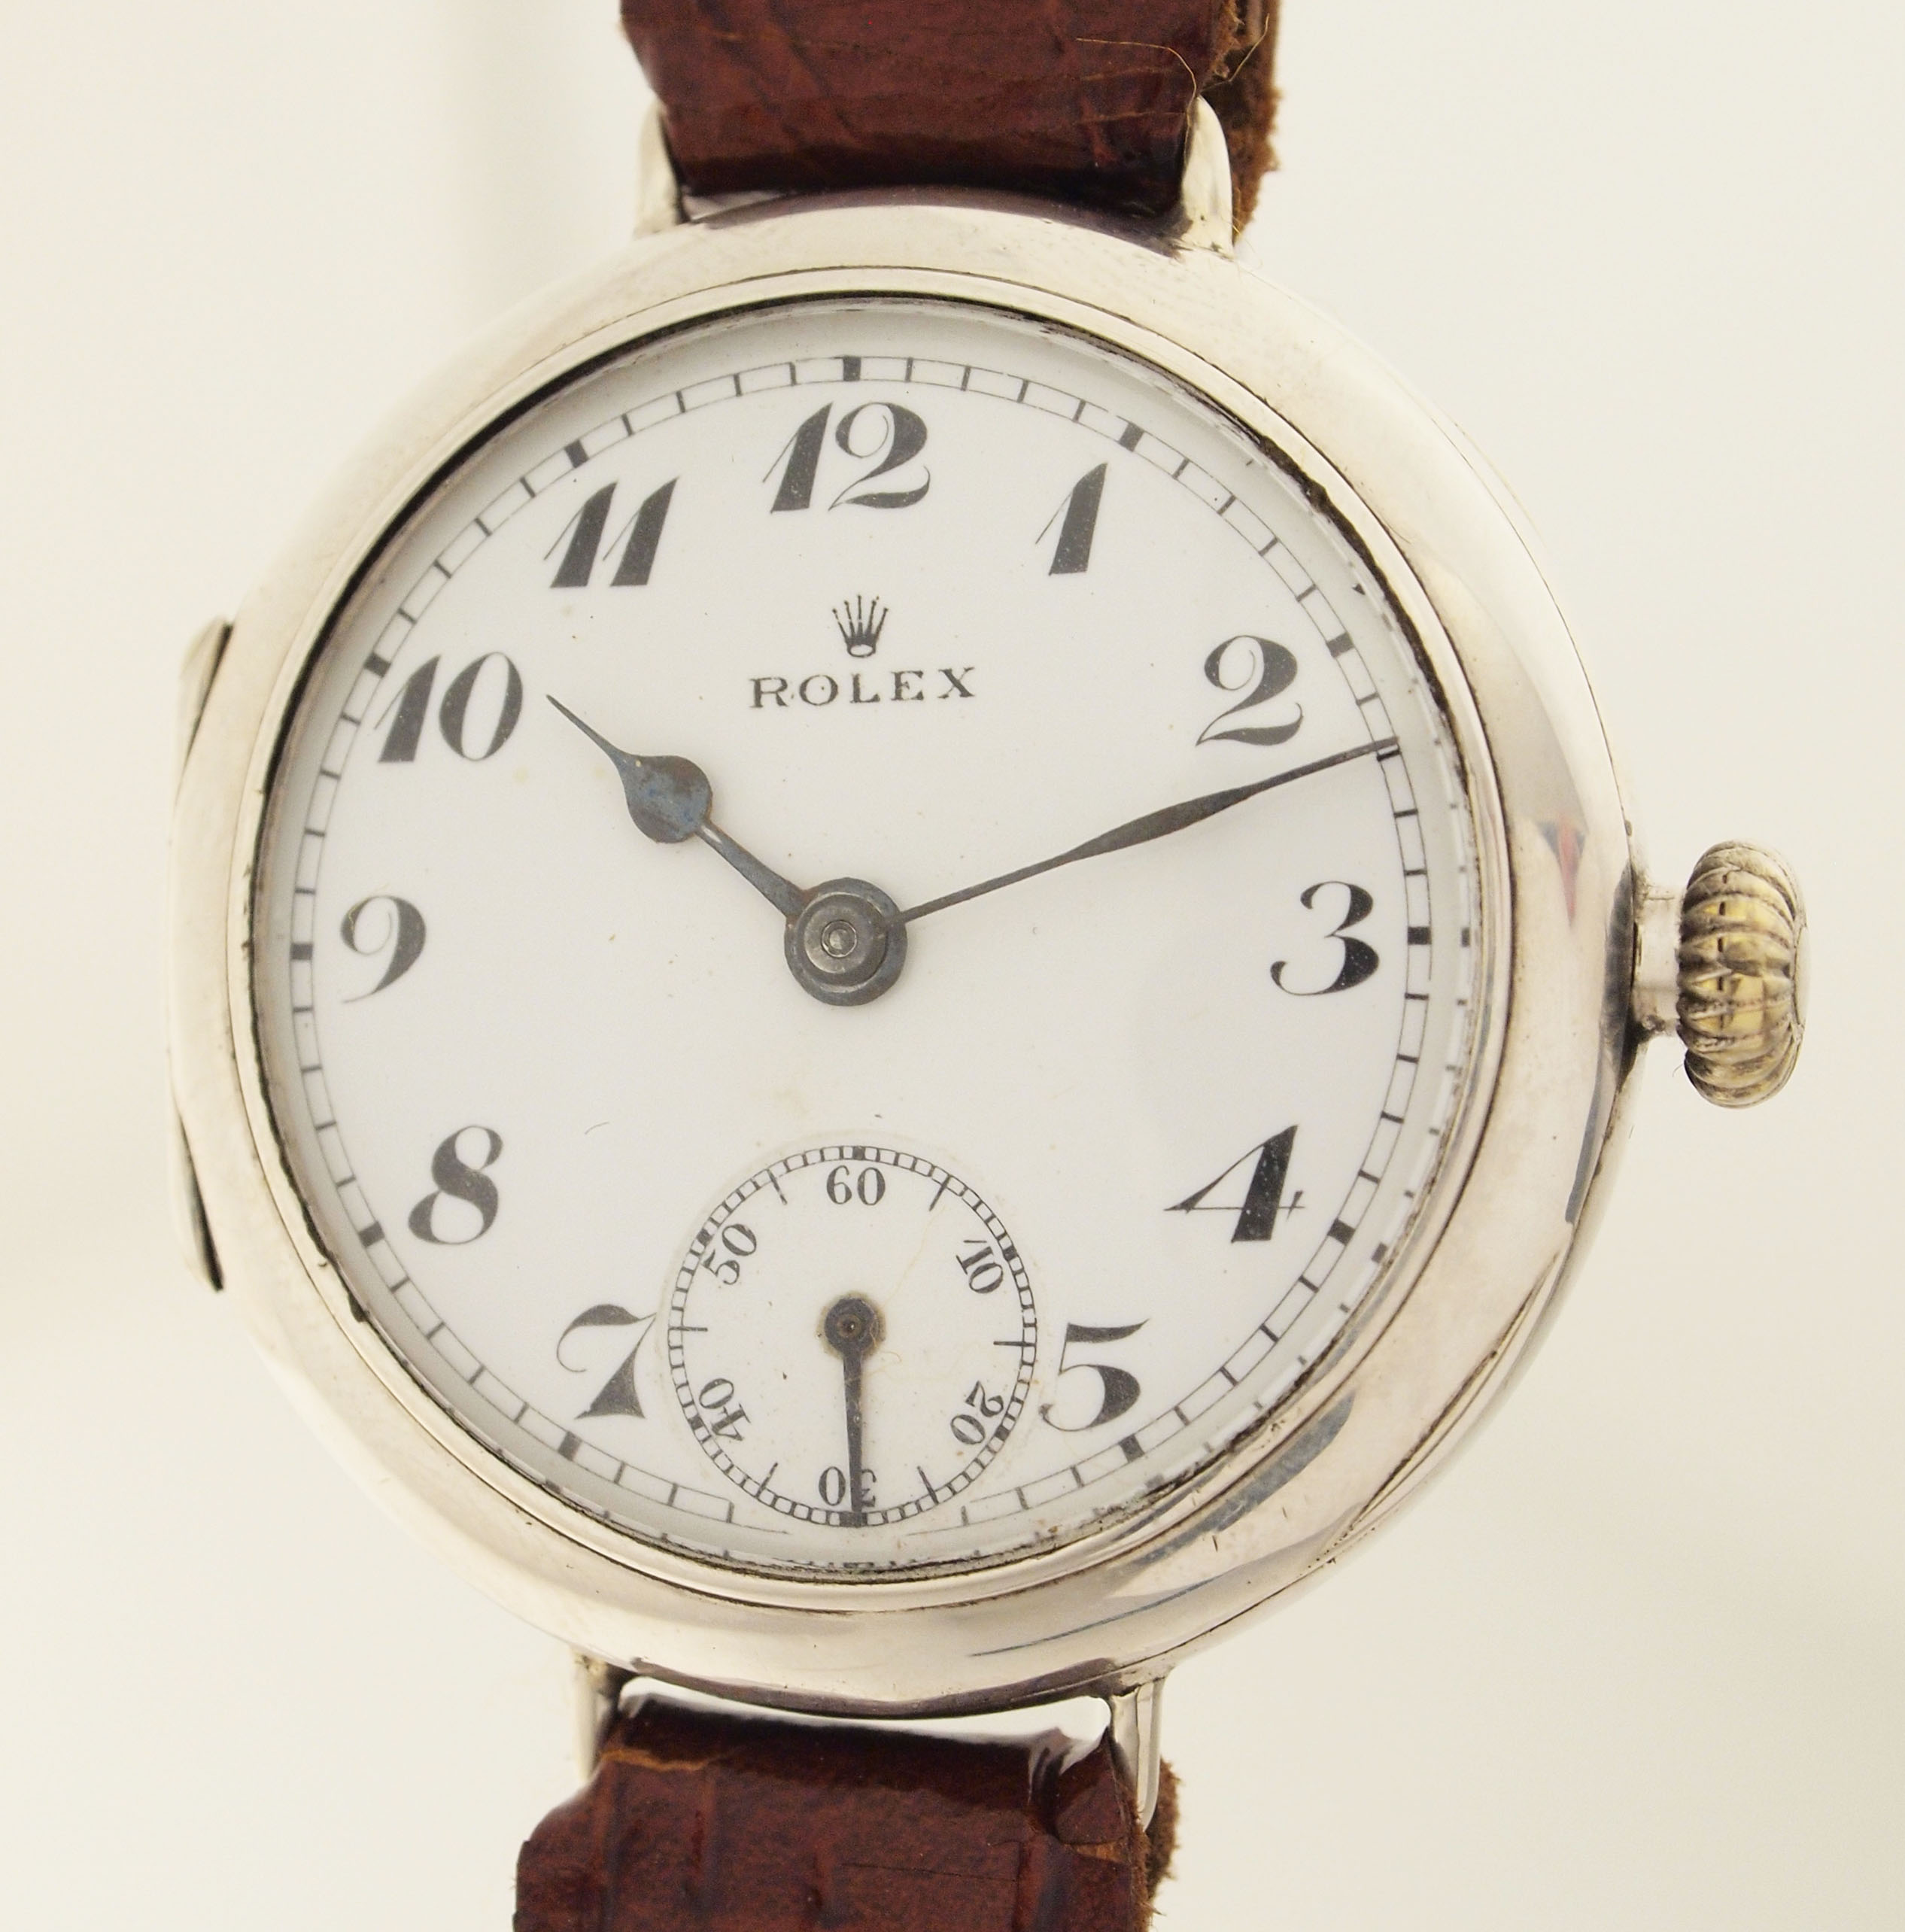 rolex eine der ersten armband uhren v hans wilsdorf london um1918 925er silber ebay. Black Bedroom Furniture Sets. Home Design Ideas